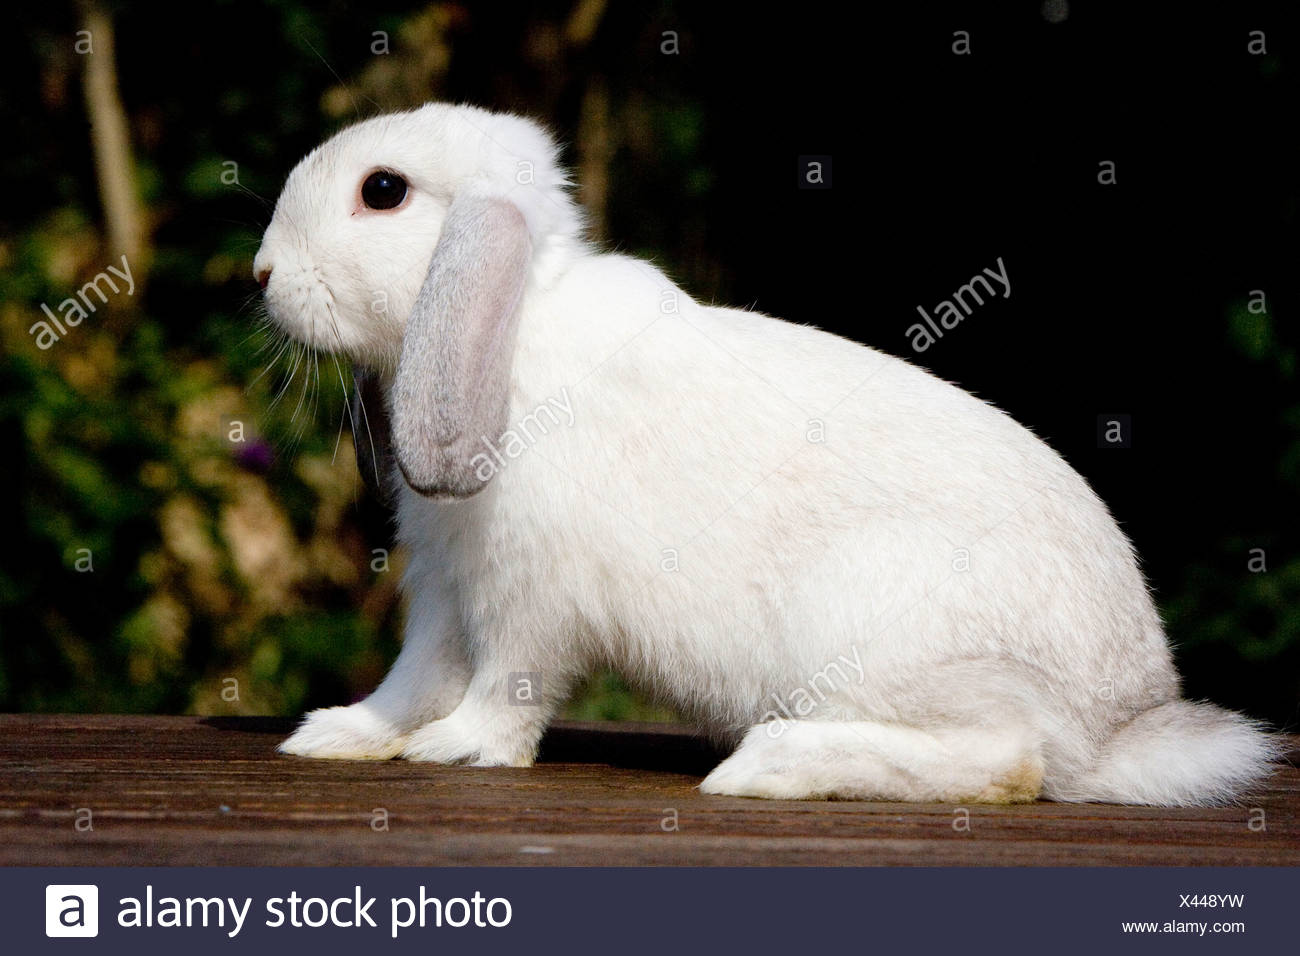 English Lop, rabbit breed, Siam yellow - Stock Image